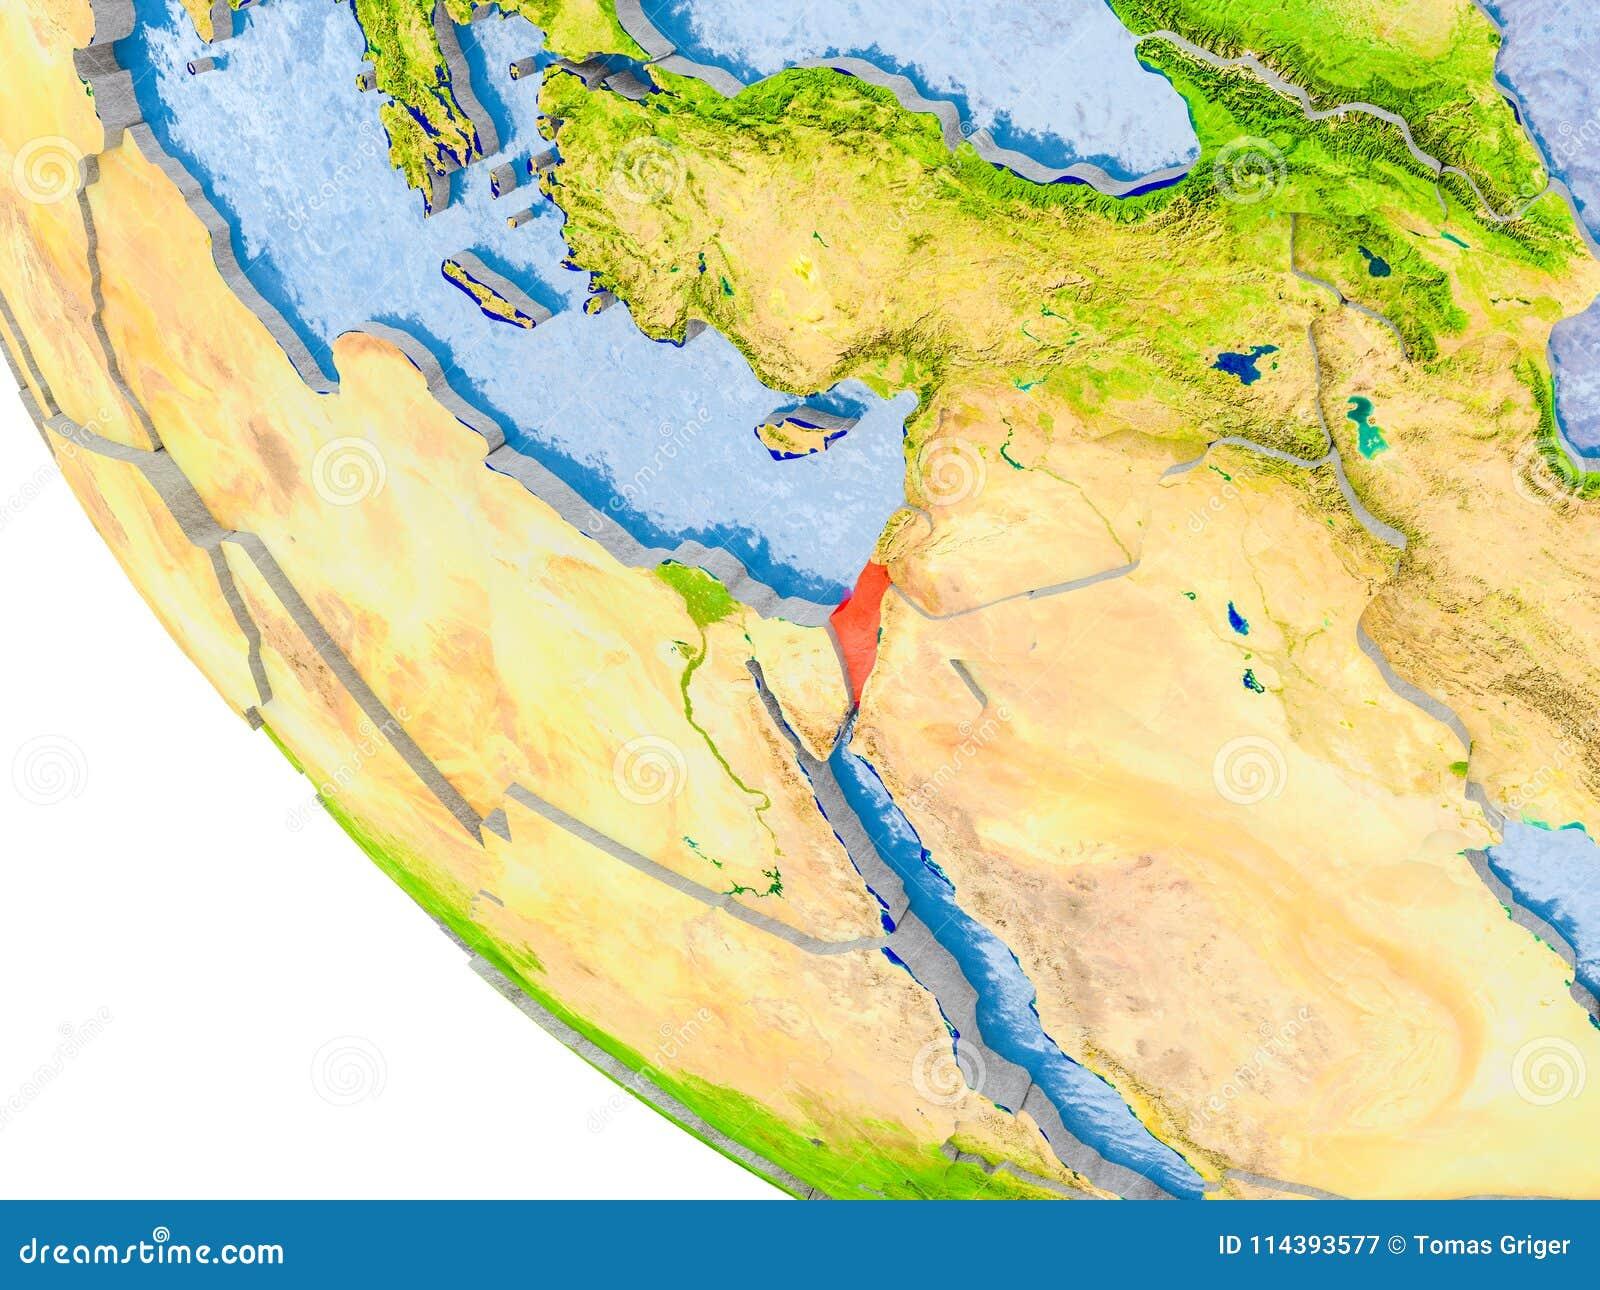 Israel on globe stock illustration. Illustration of asia - 114393577